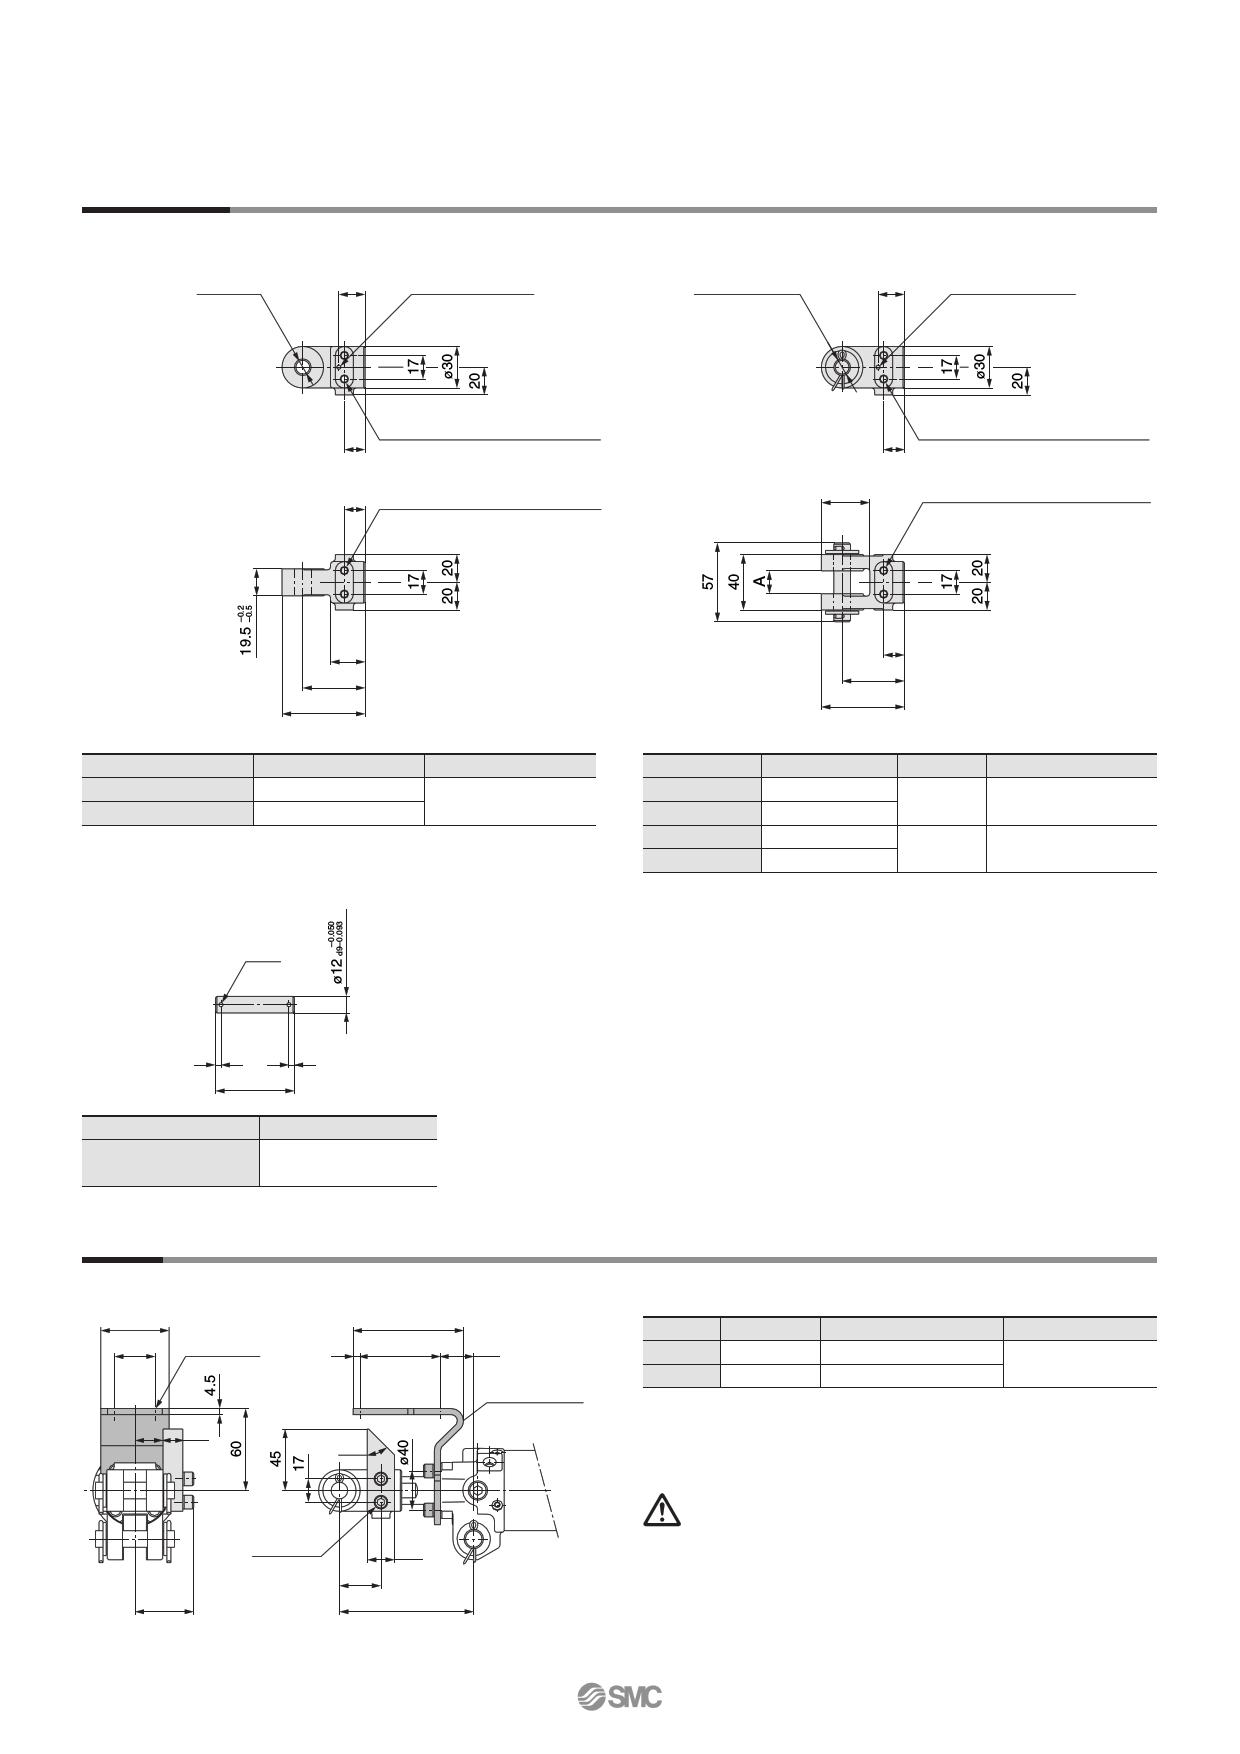 D-P74x pdf, arduino